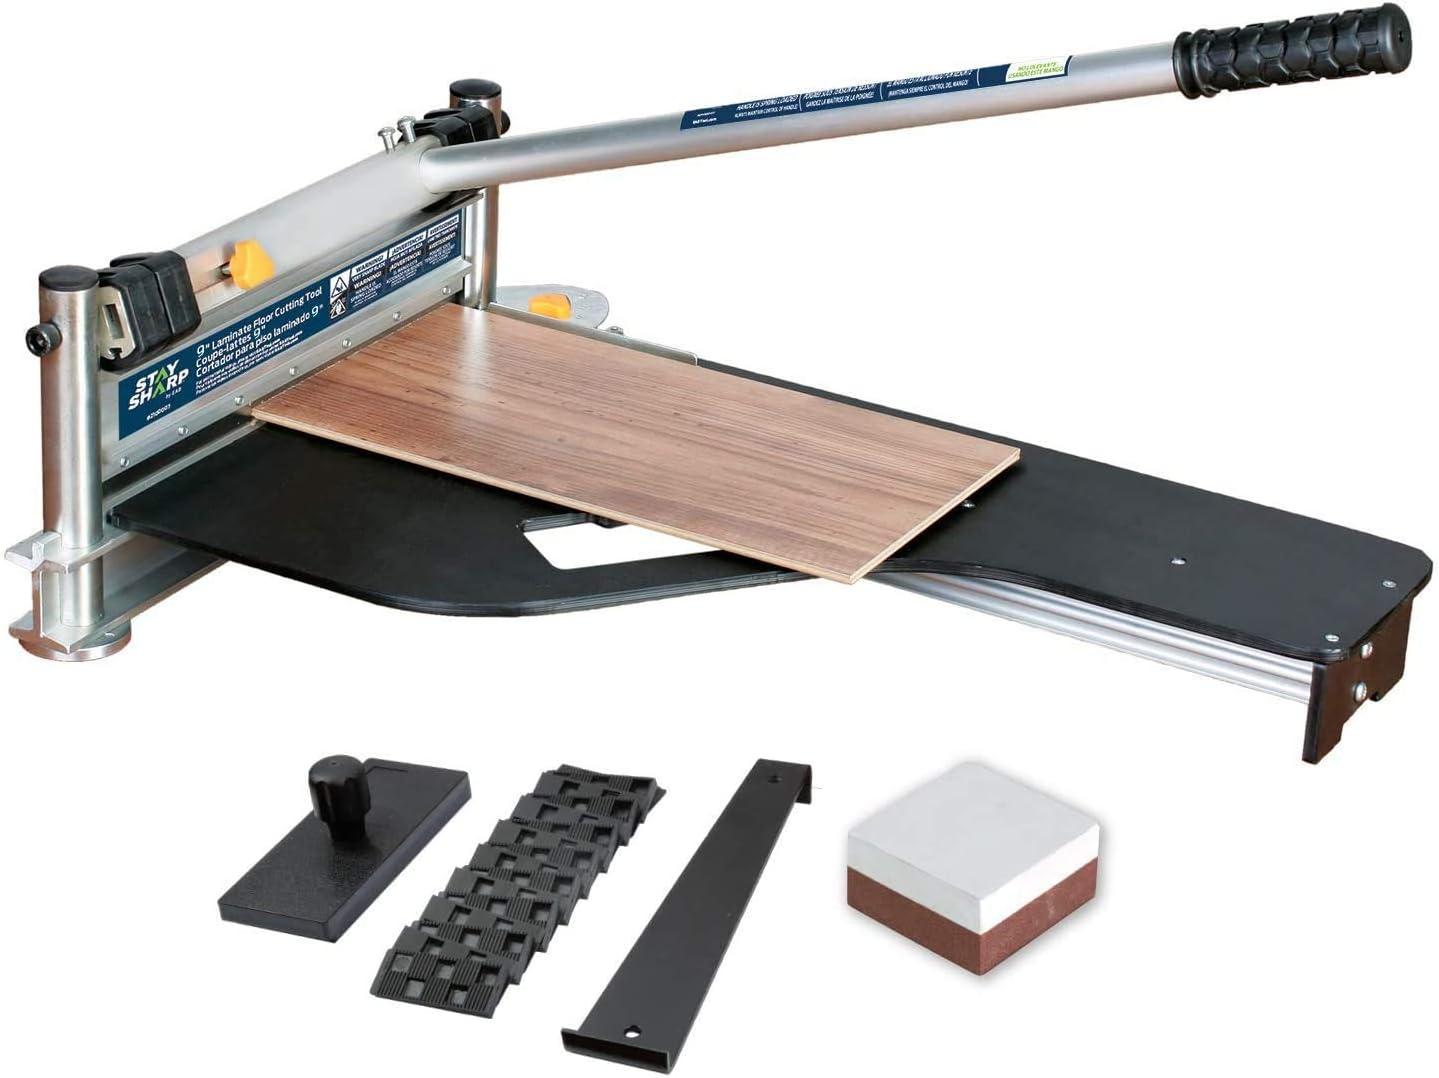 Eab Tool Exchange A Blade 2100005 9, Laminate Flooring Blade